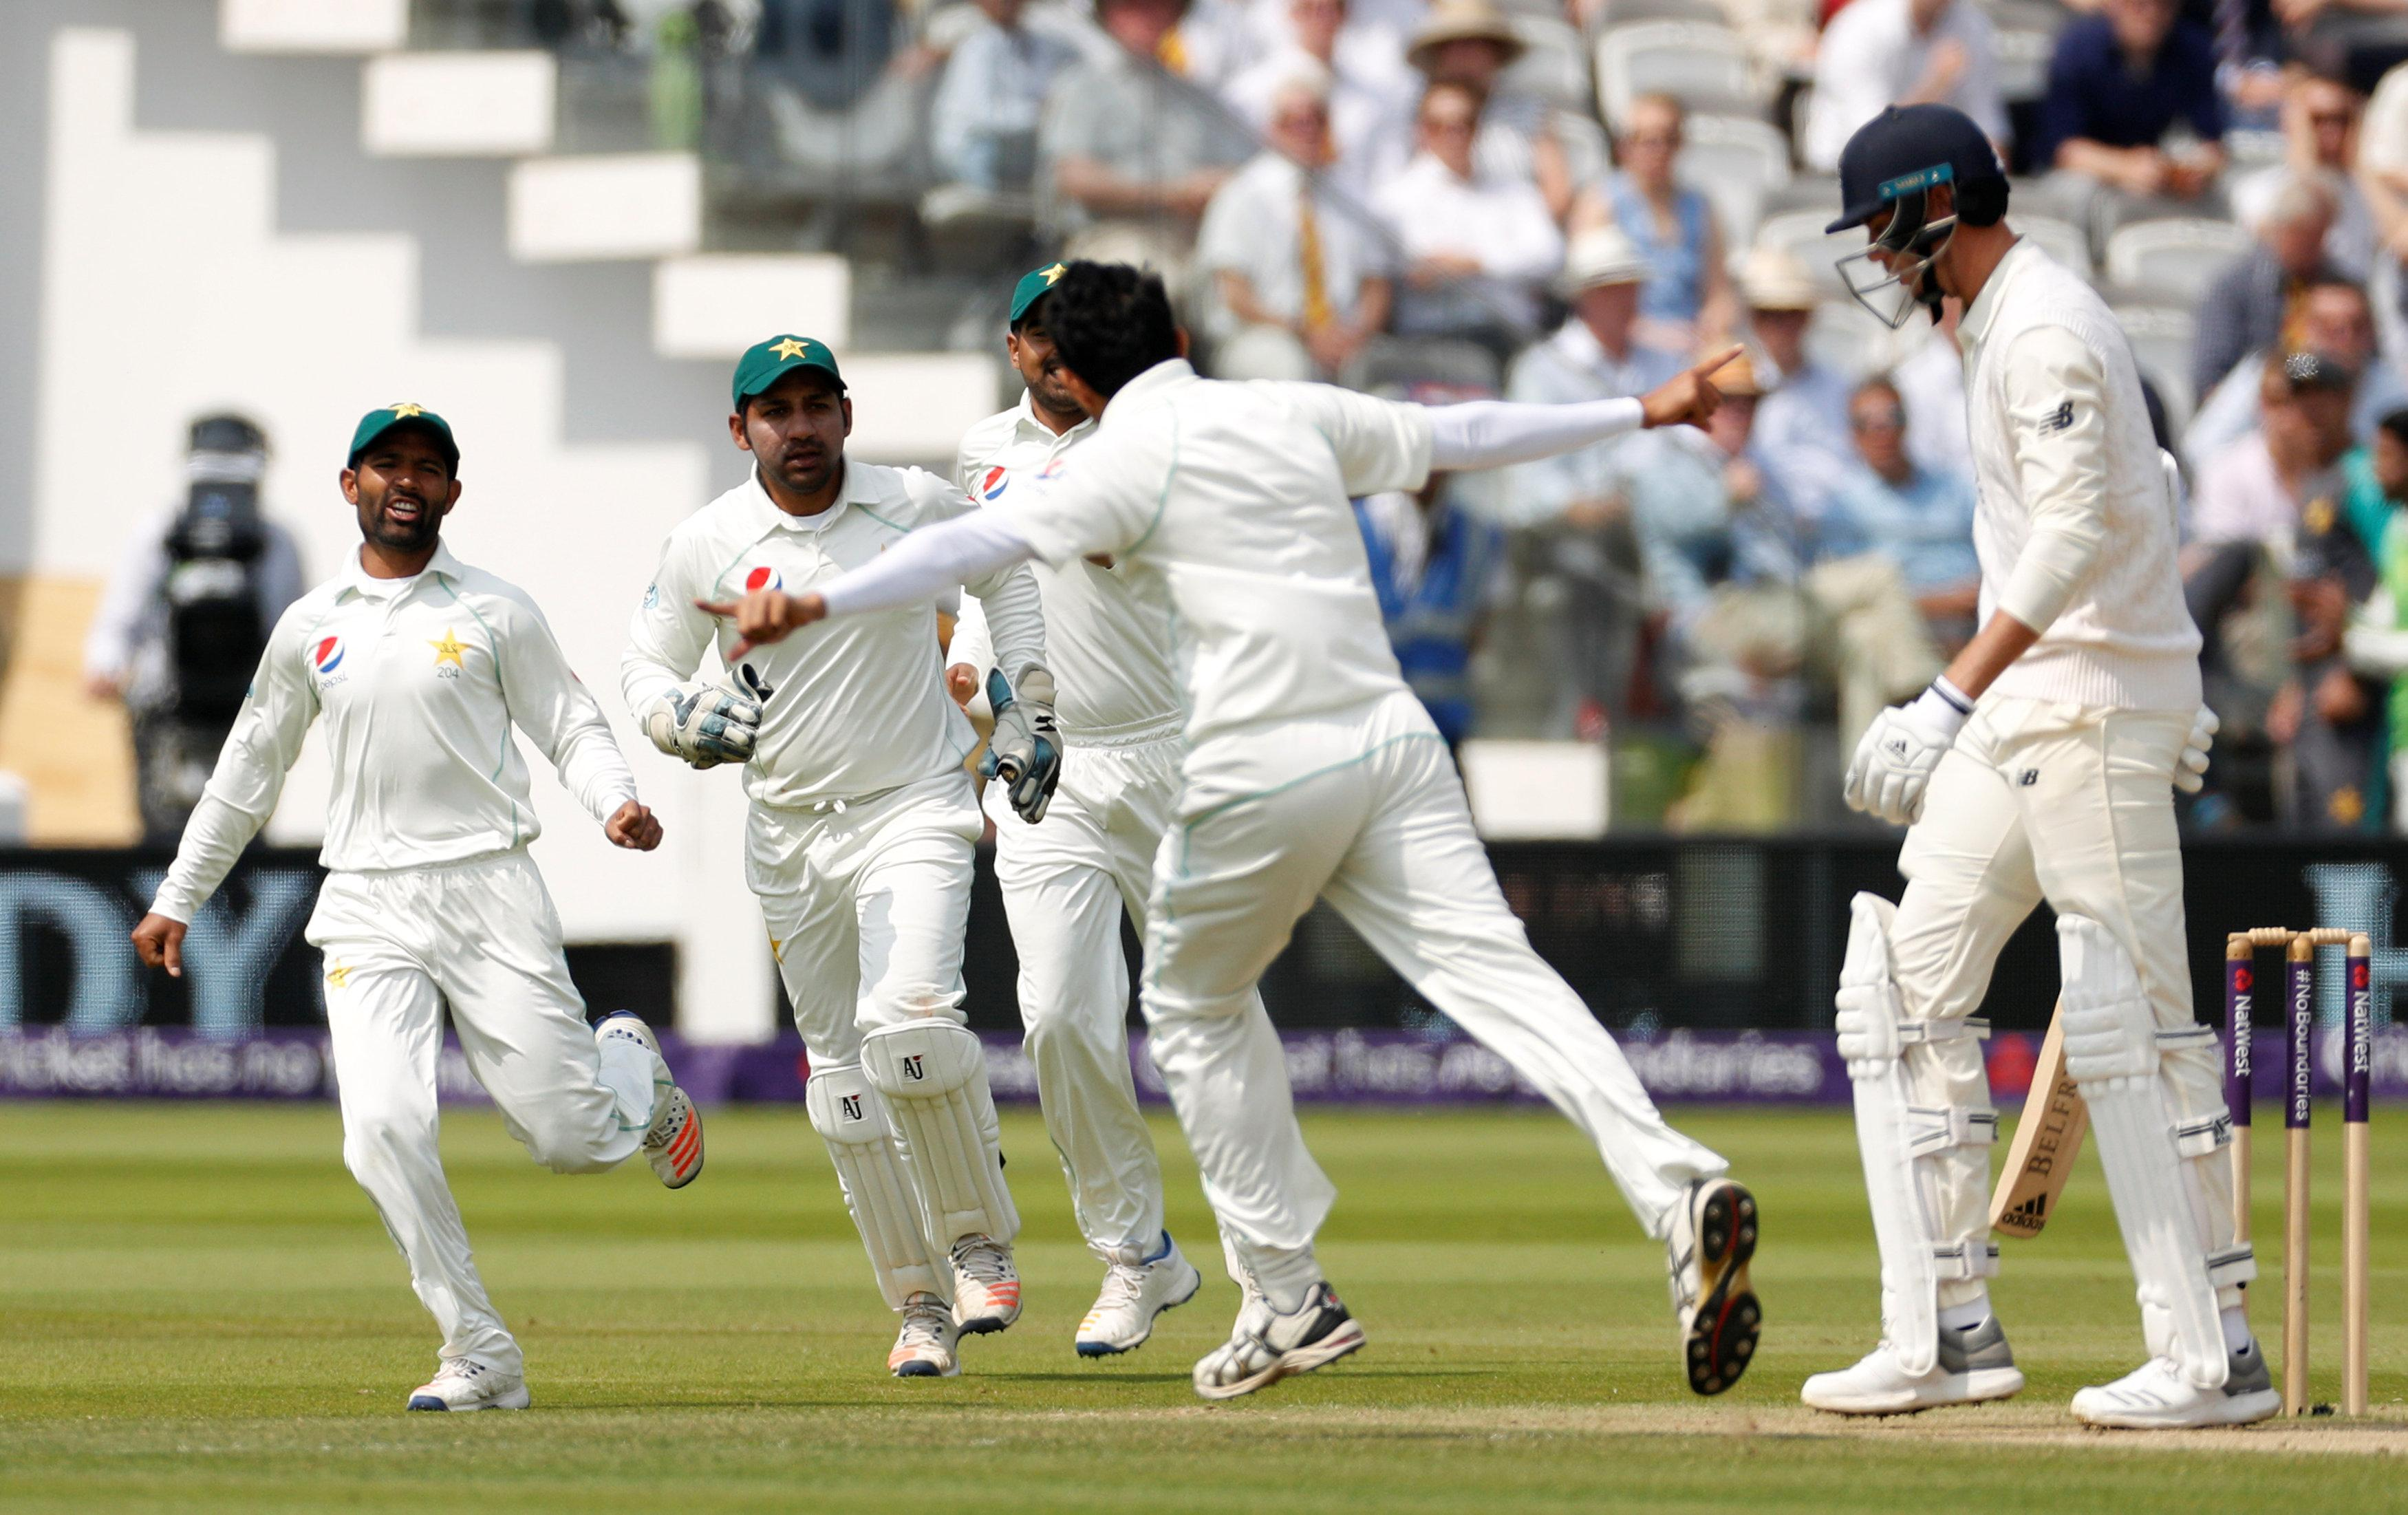 Pakistan's Sarfraz Ahmed celebrates as he dismisses England's Stuart Broad at Lord's